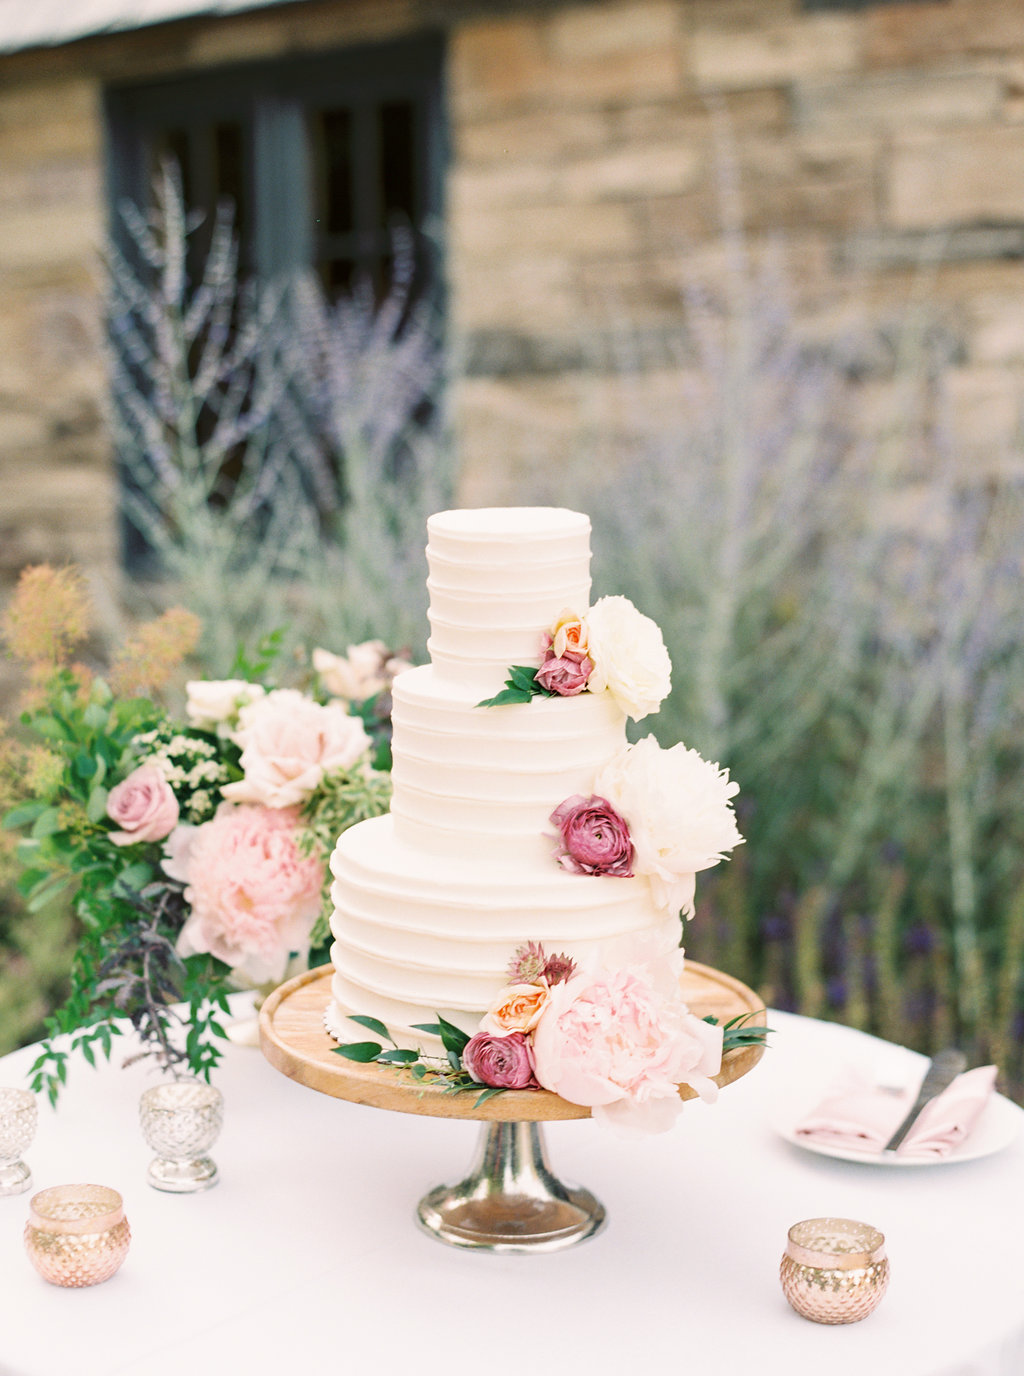 alegria-by-design-wedding-planner-planning-event-design-santa-barbara-day-of-coordinator-kestrel-park-santa-ynez-fields-castle-lavender-garden-mrs-box (45).jpg